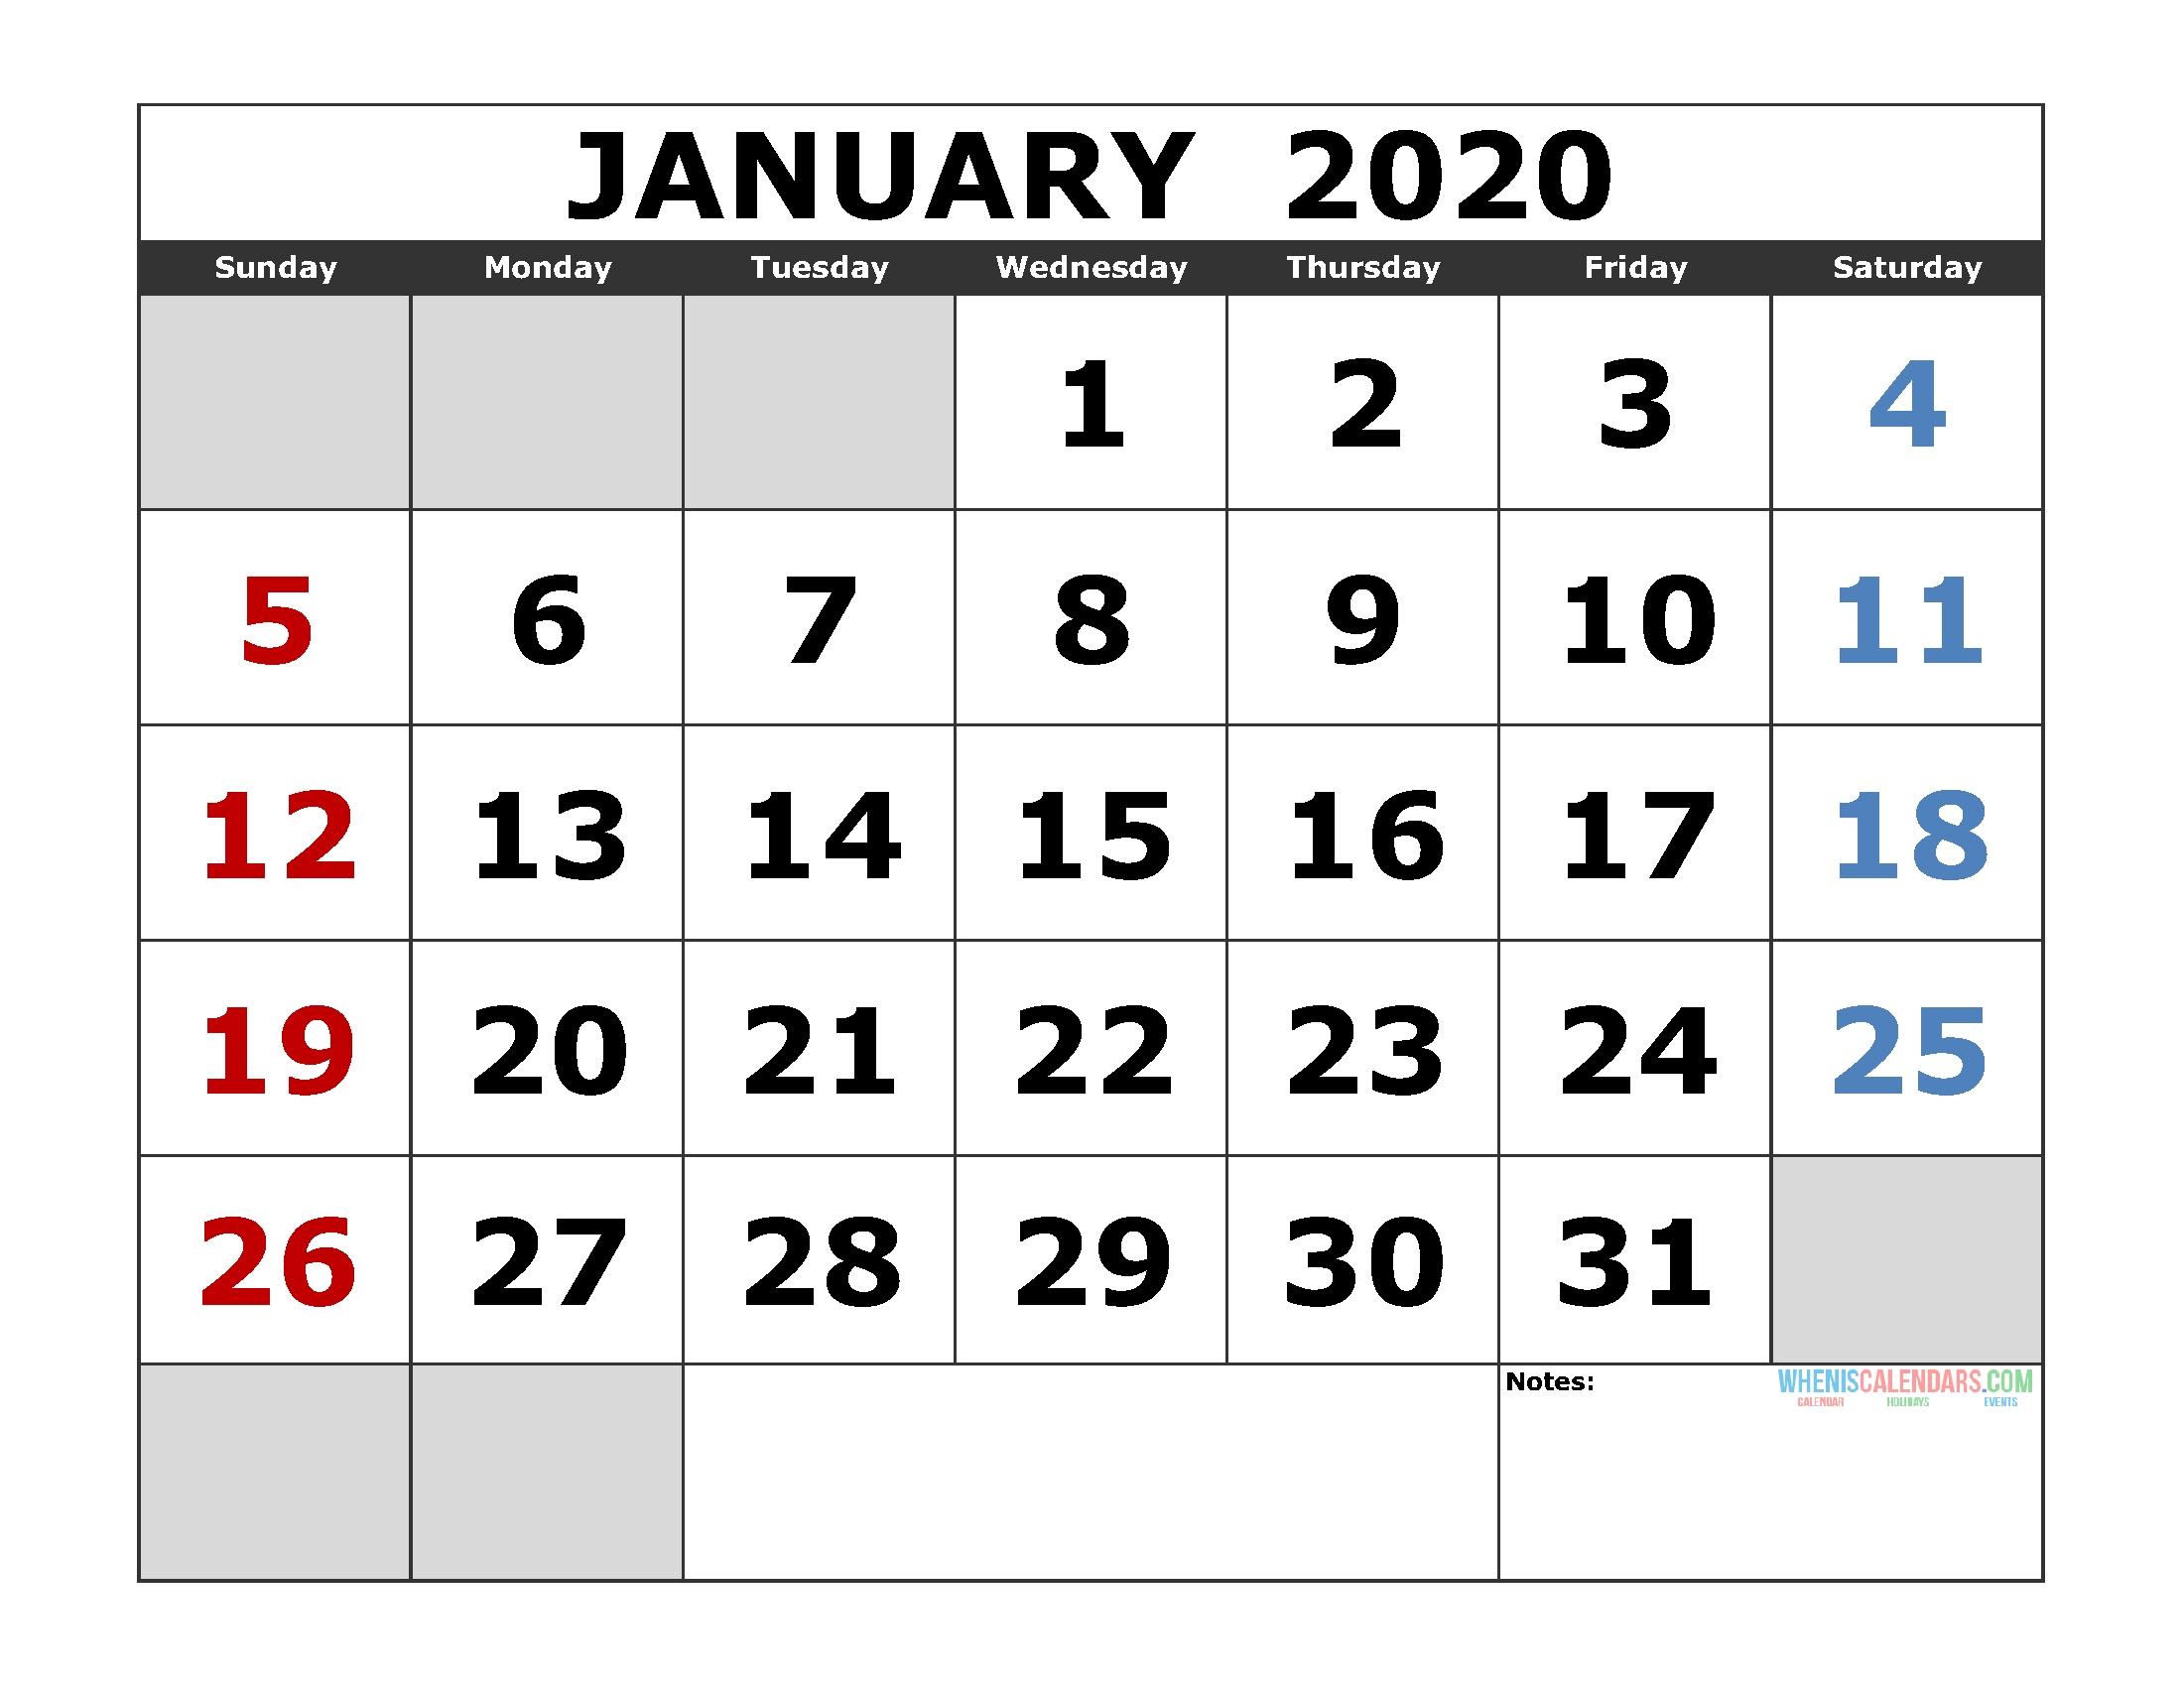 January 2020 Printable Calendar Template Excel, Pdf, Image-January 2020 Calendar In Excel